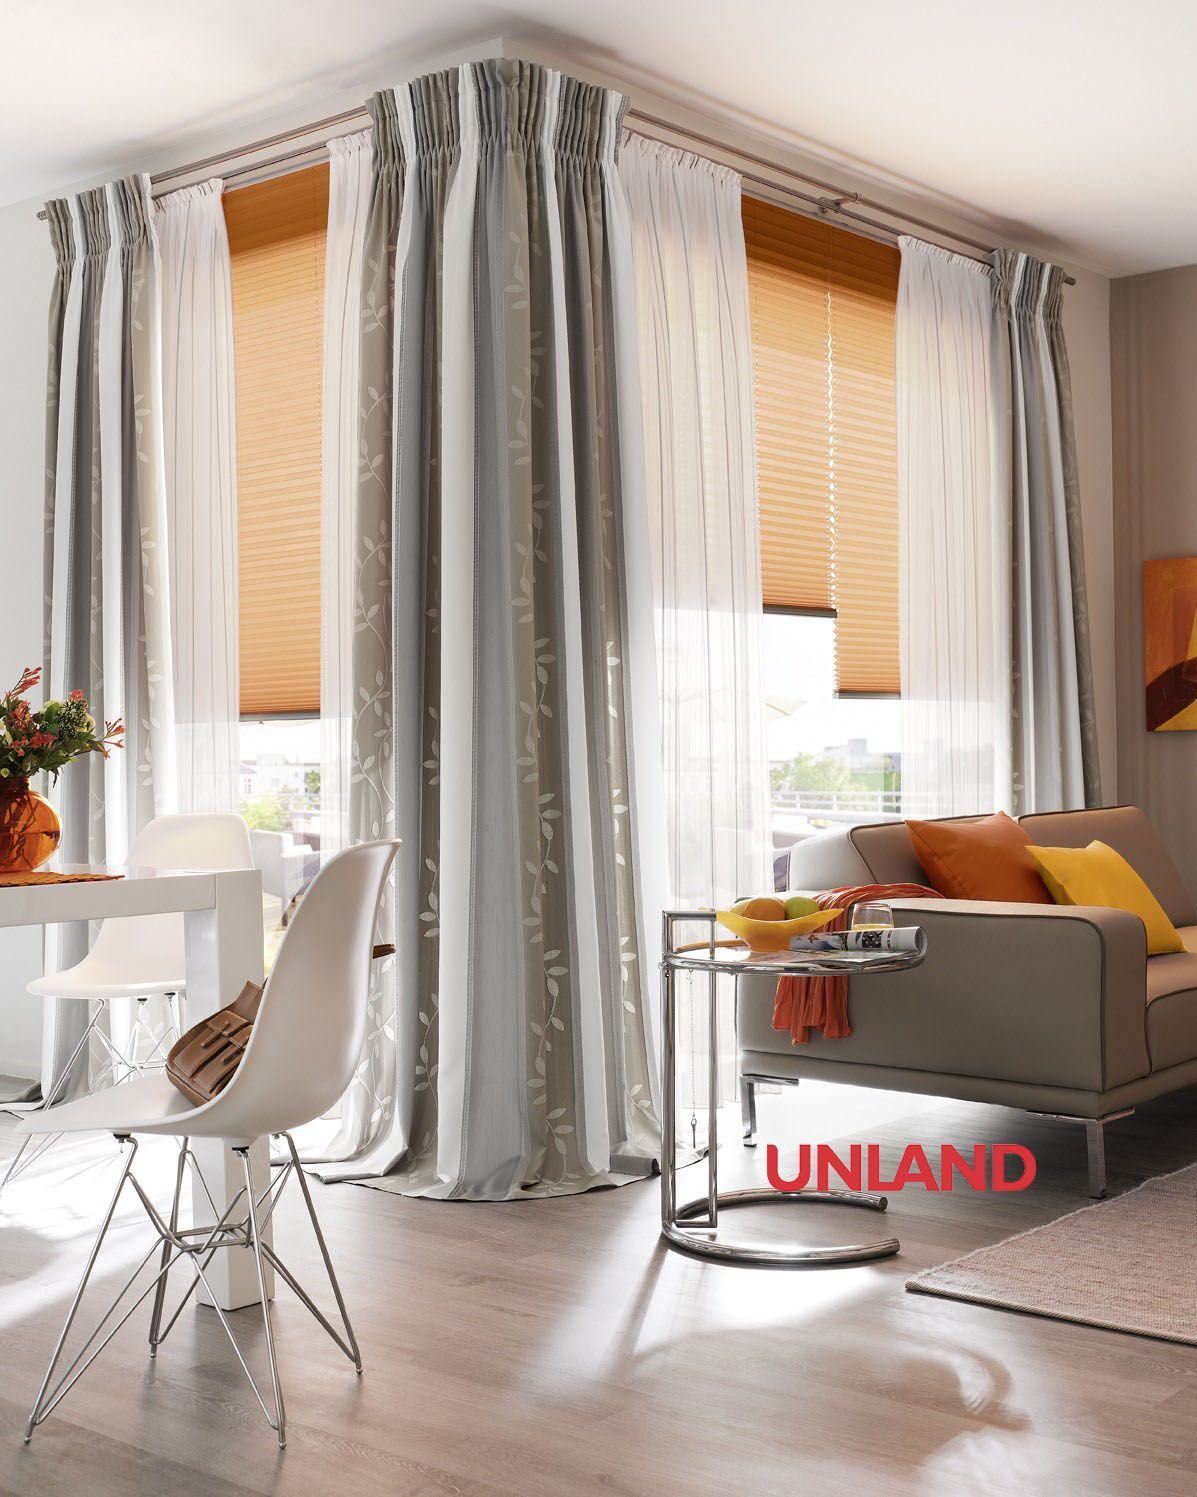 Unland Selene Fensterideen Vorhang Gardinen Und Sonnenschutz Curtains Contract Fabrics Pleated Blinds Roller Blind Home Decor Home Curtains With Blinds